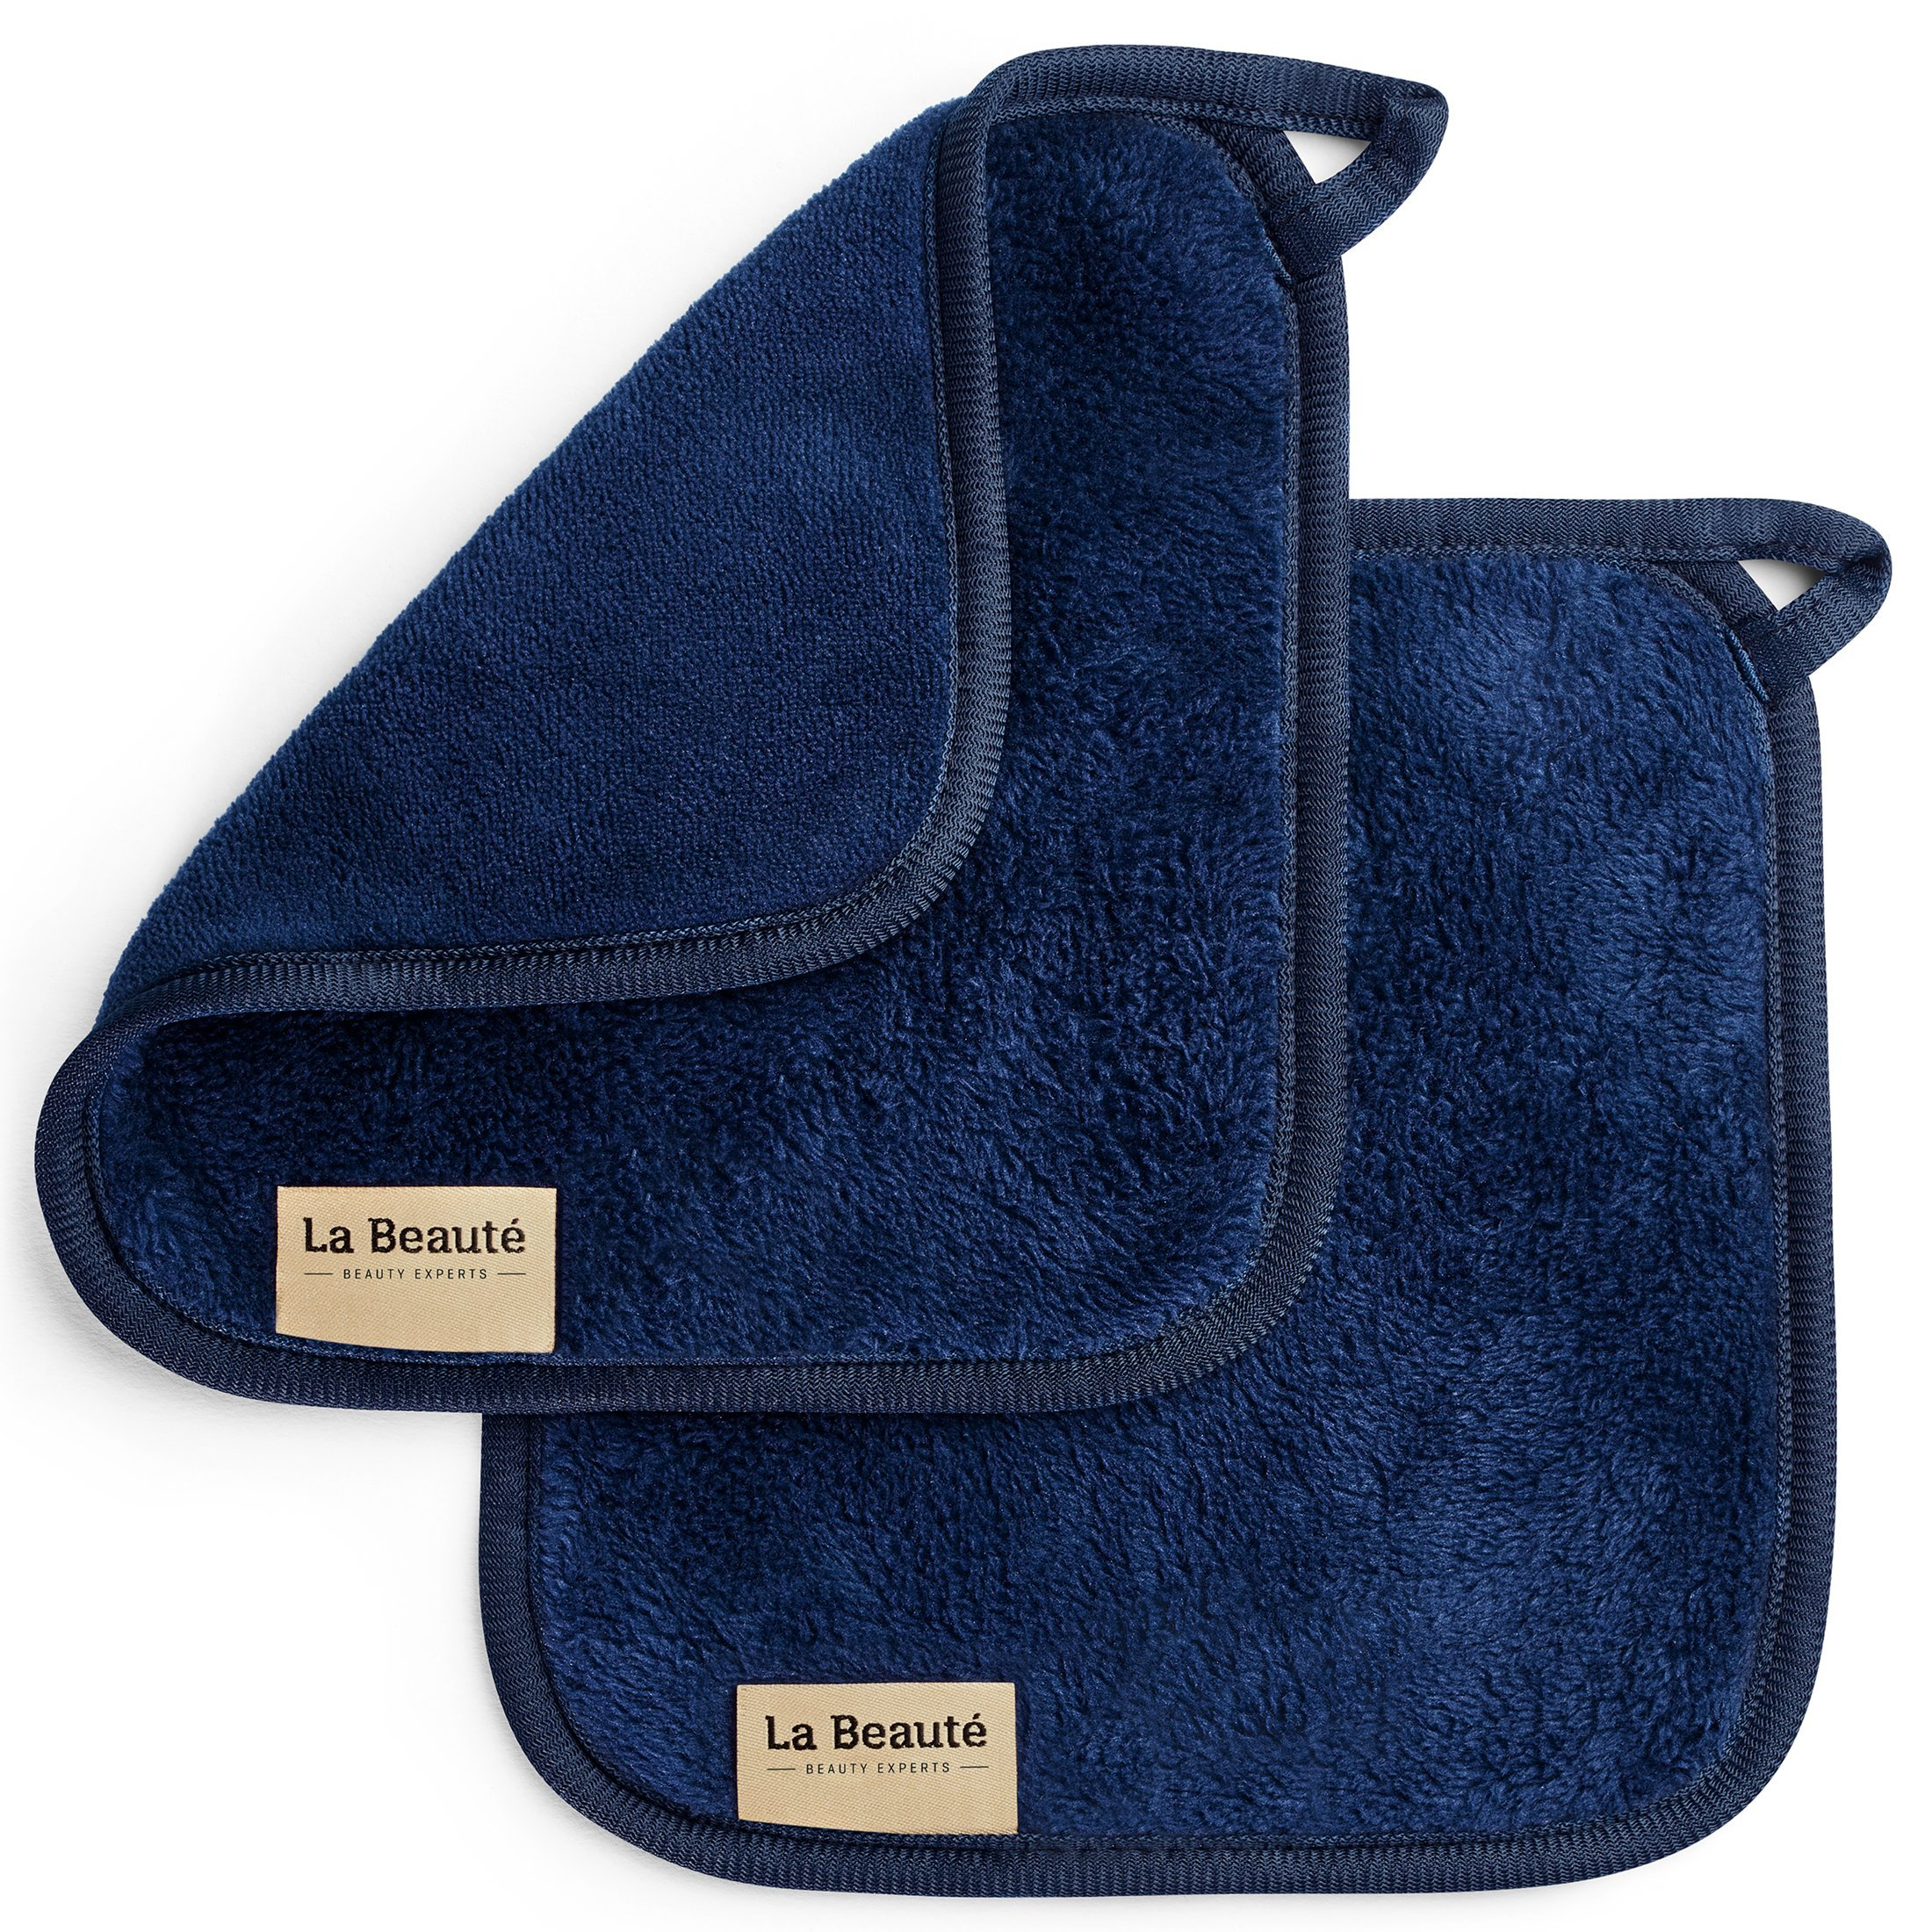 Toallitas desmaquillantes reutilizables La Beauté – Toallas para cara ecológicas y lavables – Toalla de microfibra